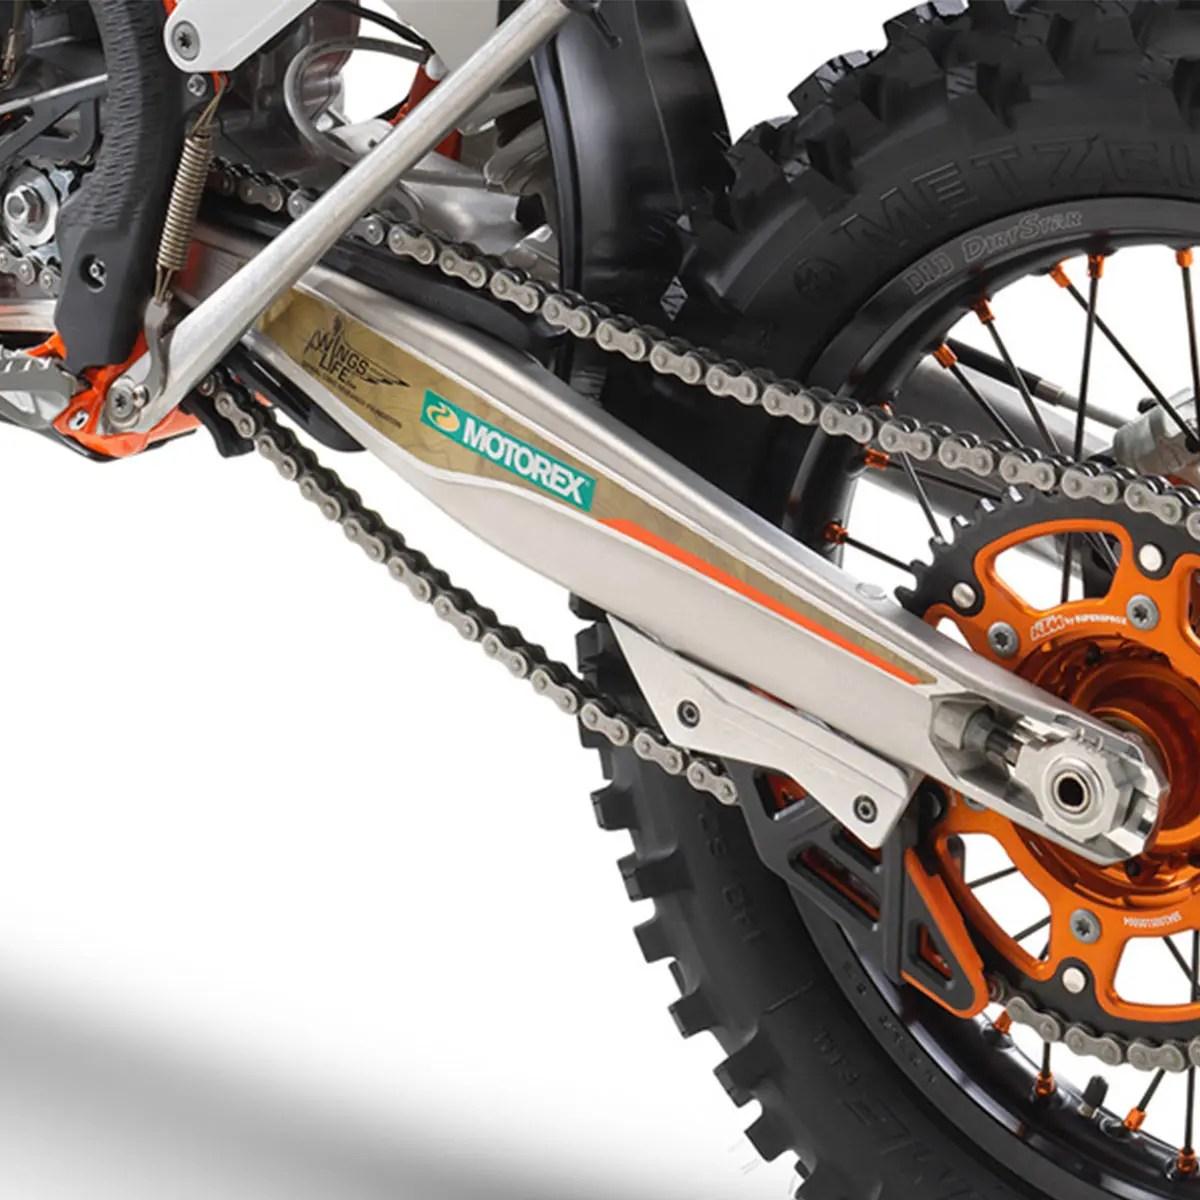 BRAS-OSCILLANT-KTM-300-EXC-TPI-ERZBERGRODEO-2020